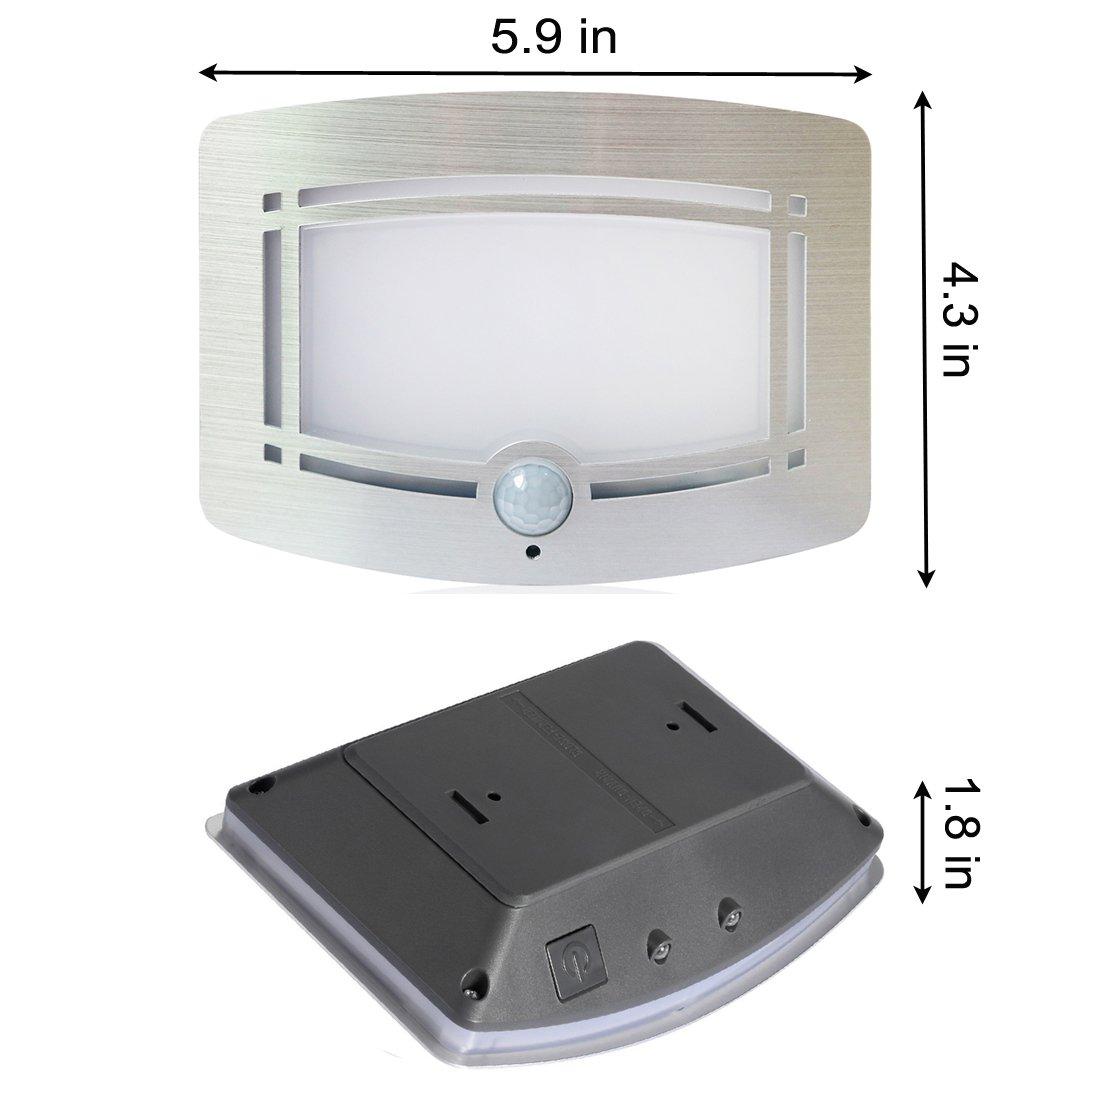 Motion Sensor LED Night Light,Wireless Battery Powered Wall Lamp,Stick Anywhere Wall Sconce,Aluminum Case Closet Light,Safe Light for Stair, Hallway,Bathrom,Bedroom,Kitchen by Kalefu (Image #7)